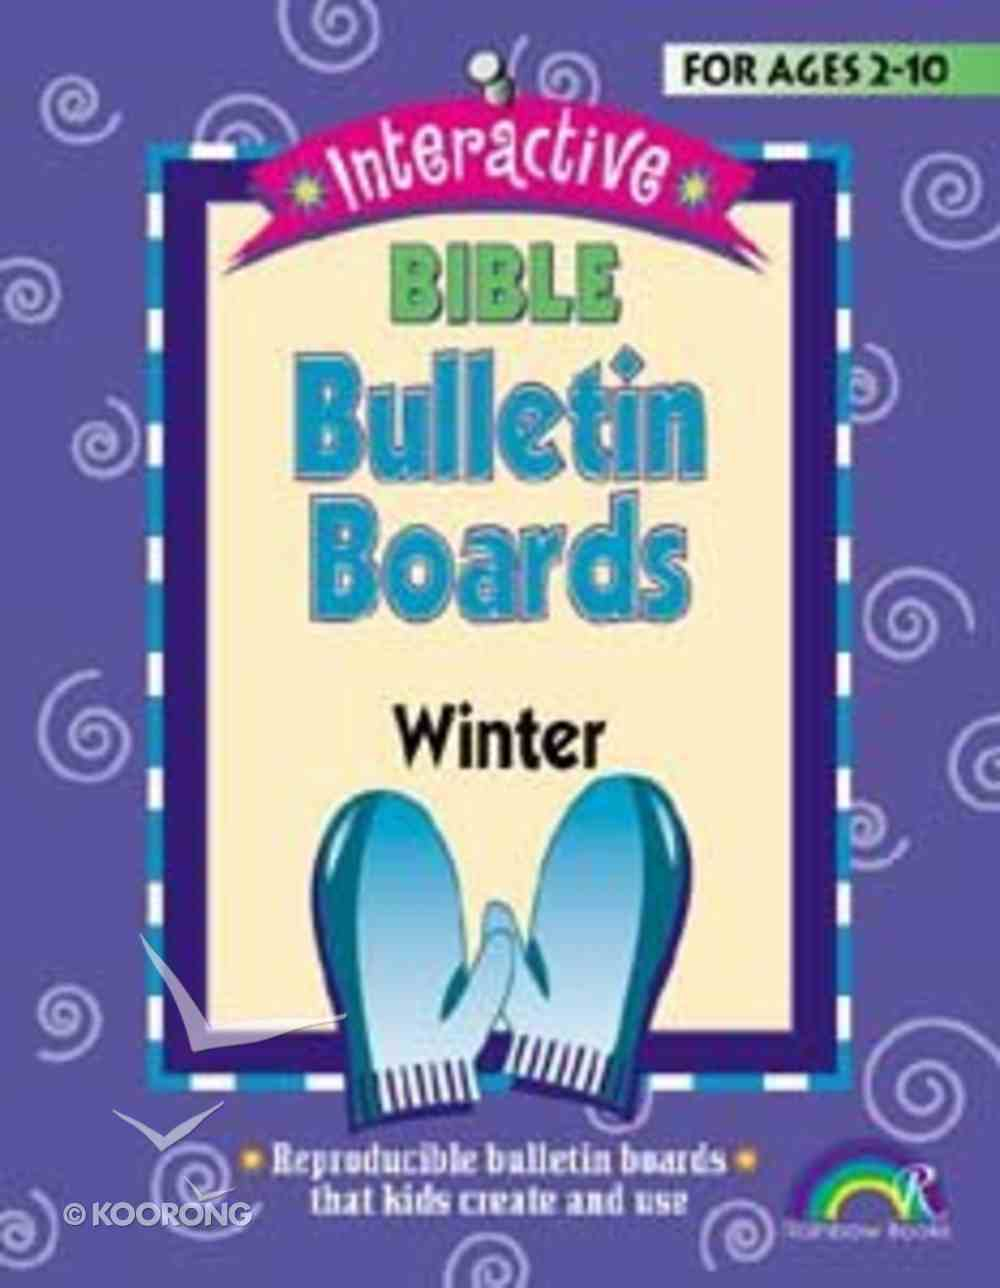 Interactive Bible Bulletin Boards: Winter Paperback